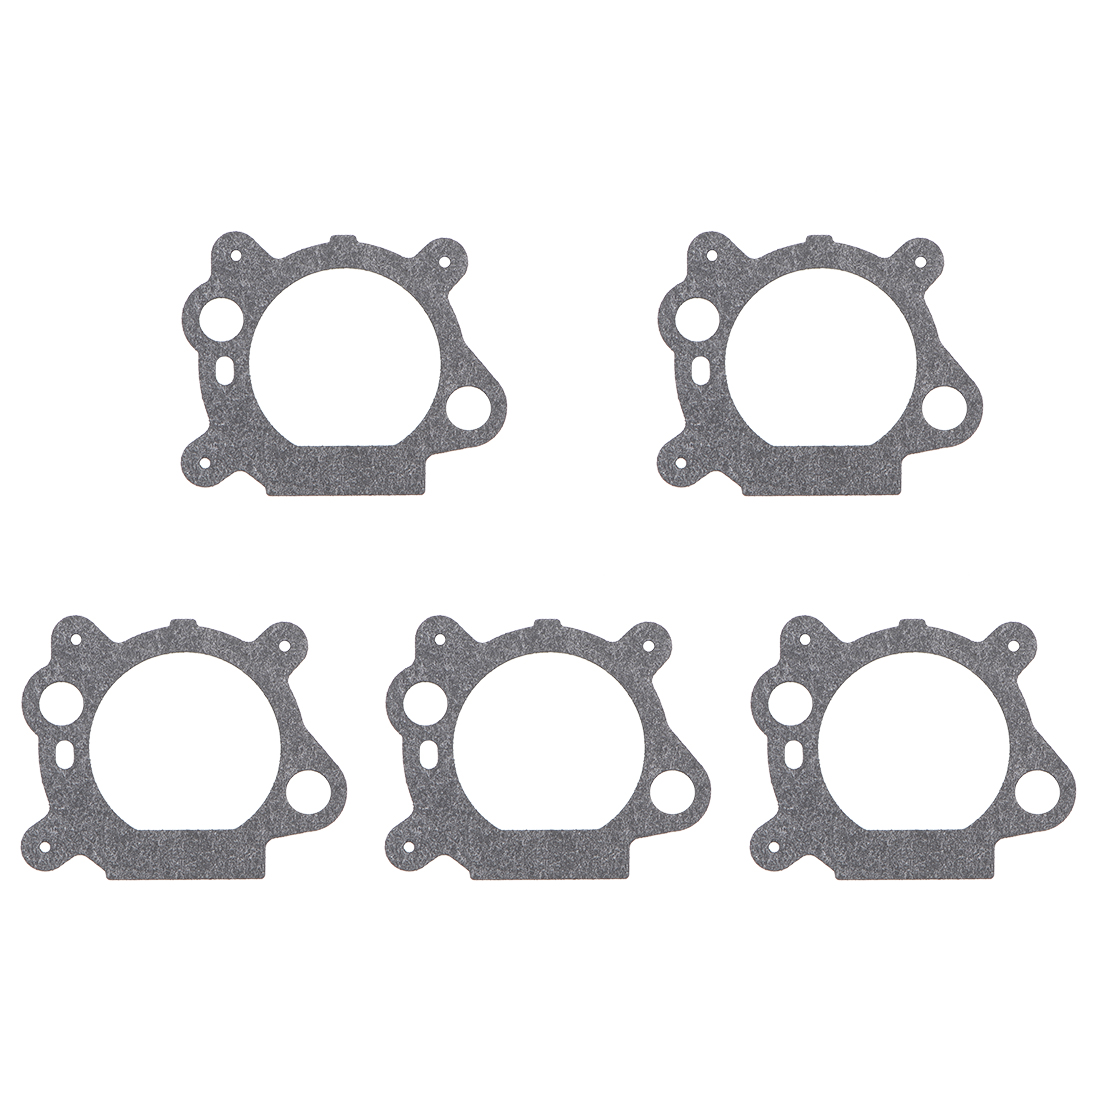 795629 Carburetor Rebuild Kit for Briggs Stratton 272653 272653S 5pcs